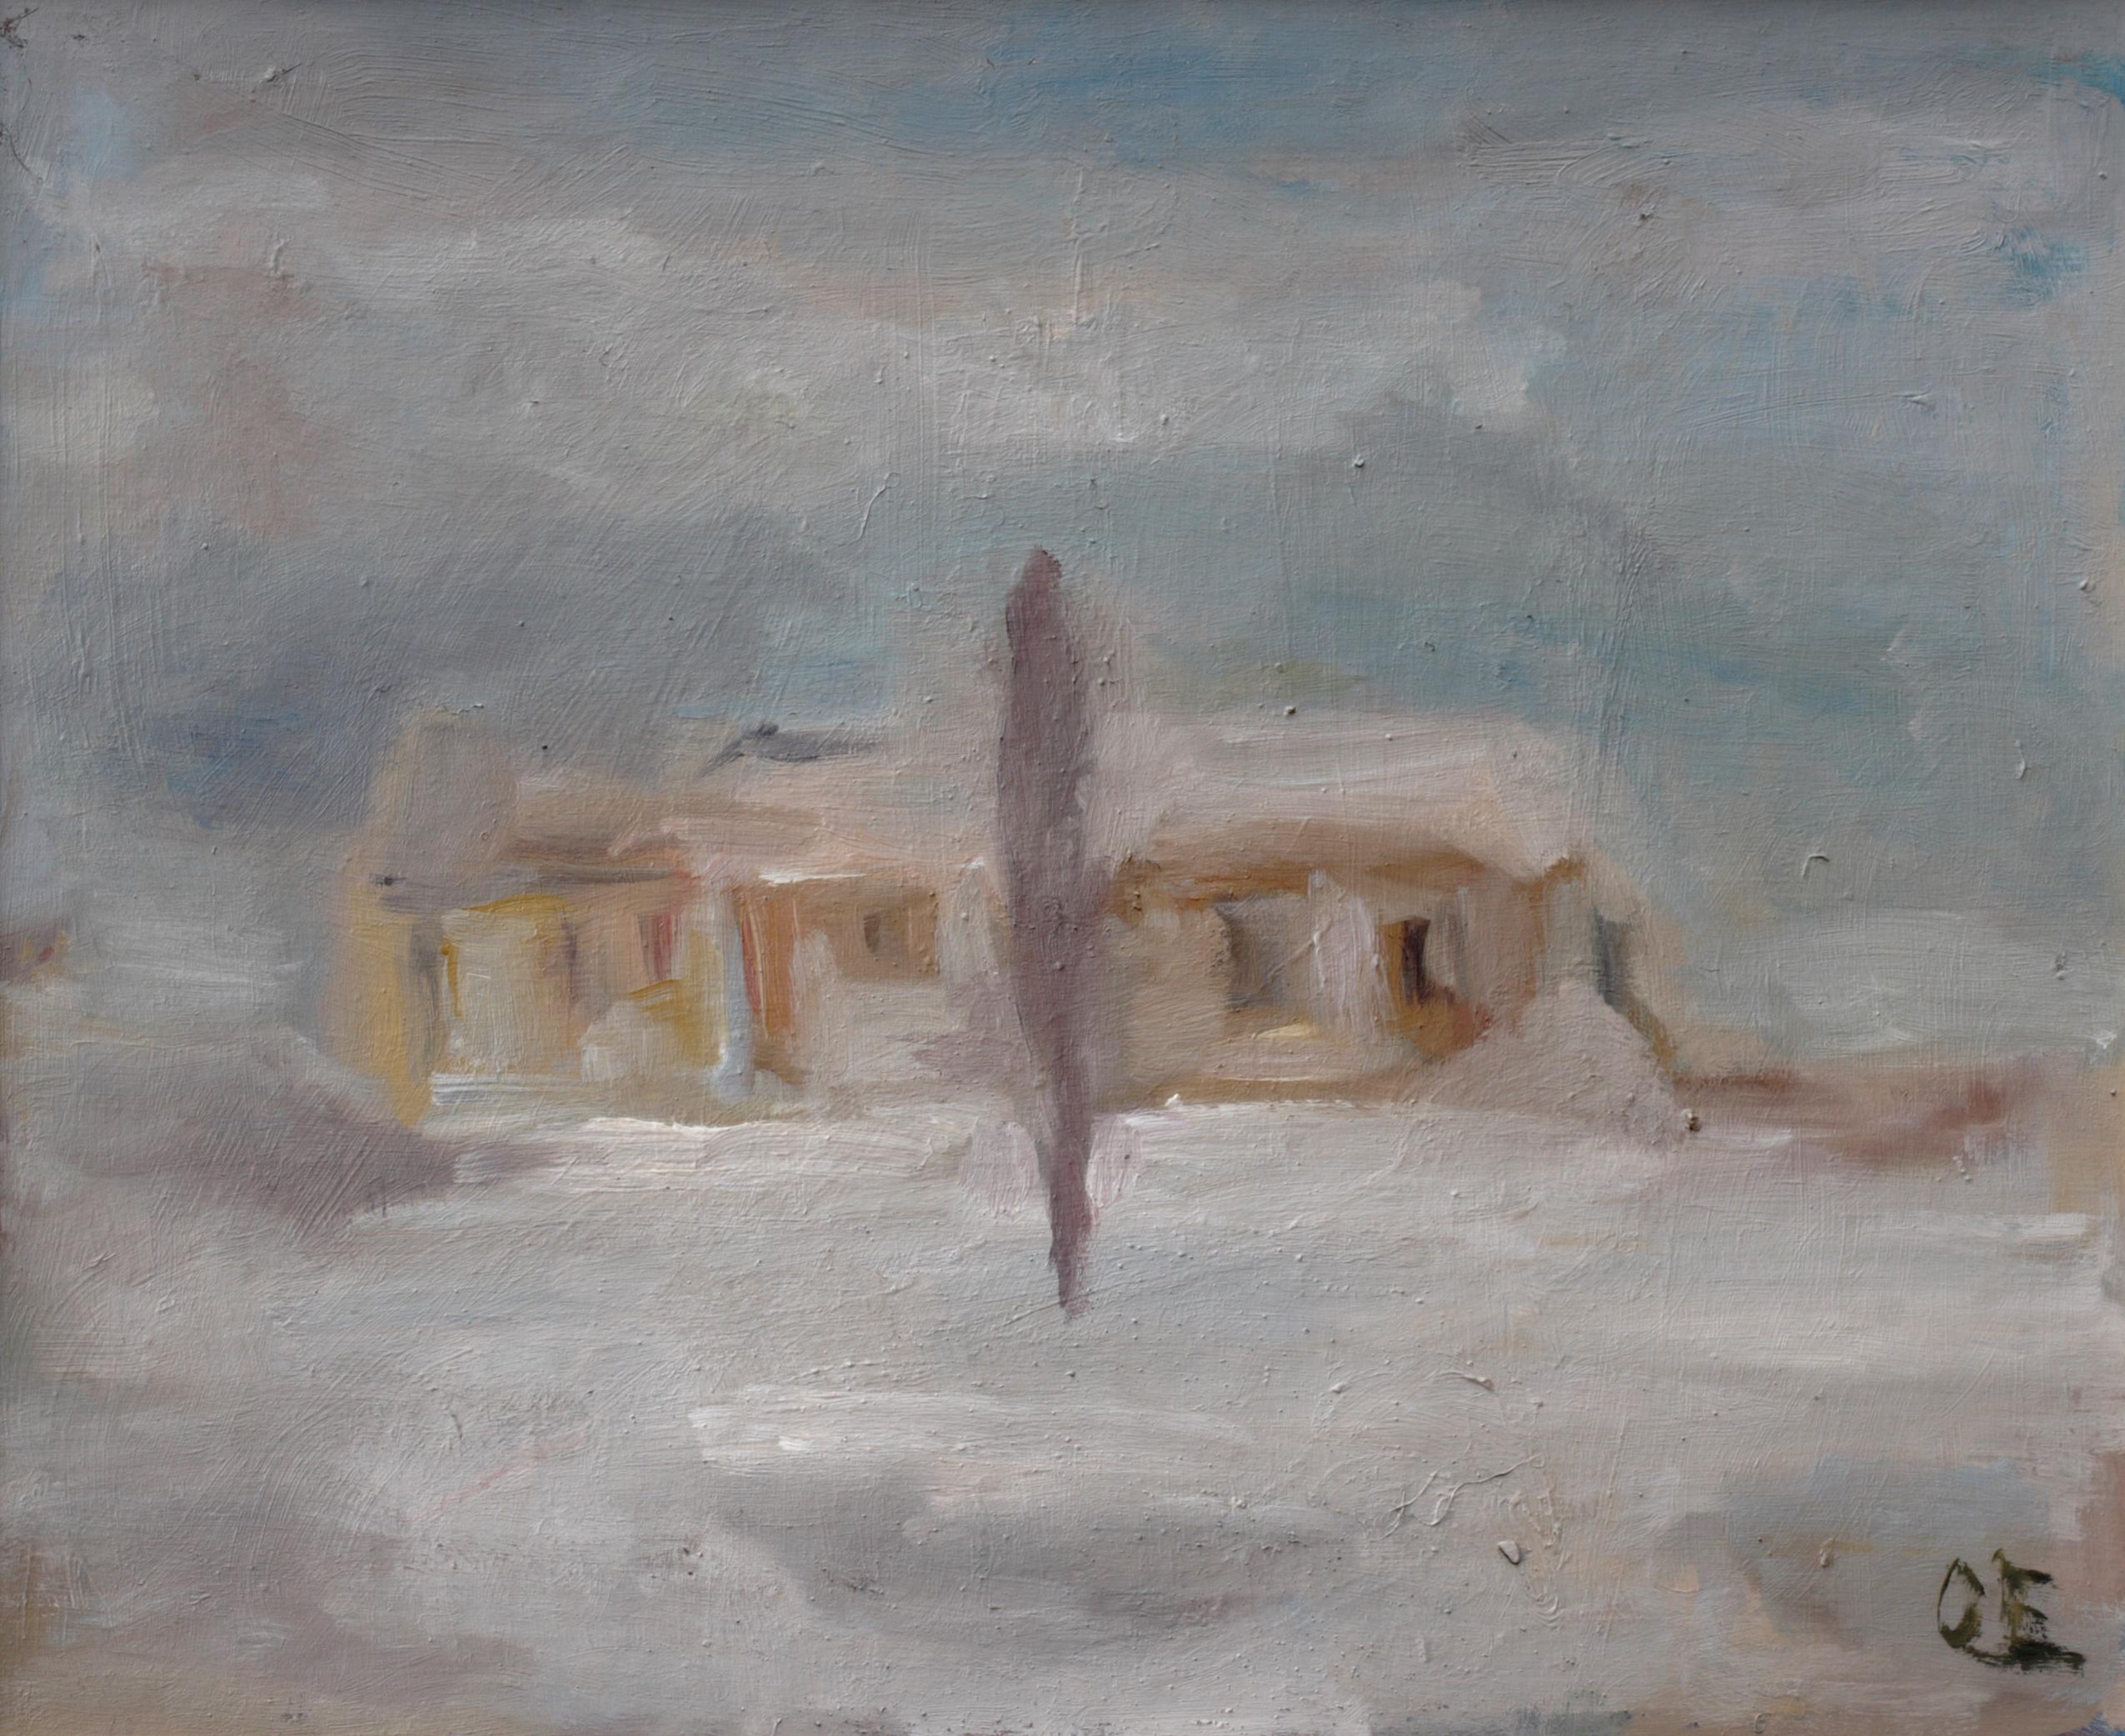 Пейзаж 'Къщи' 3 от Олга Белопитова